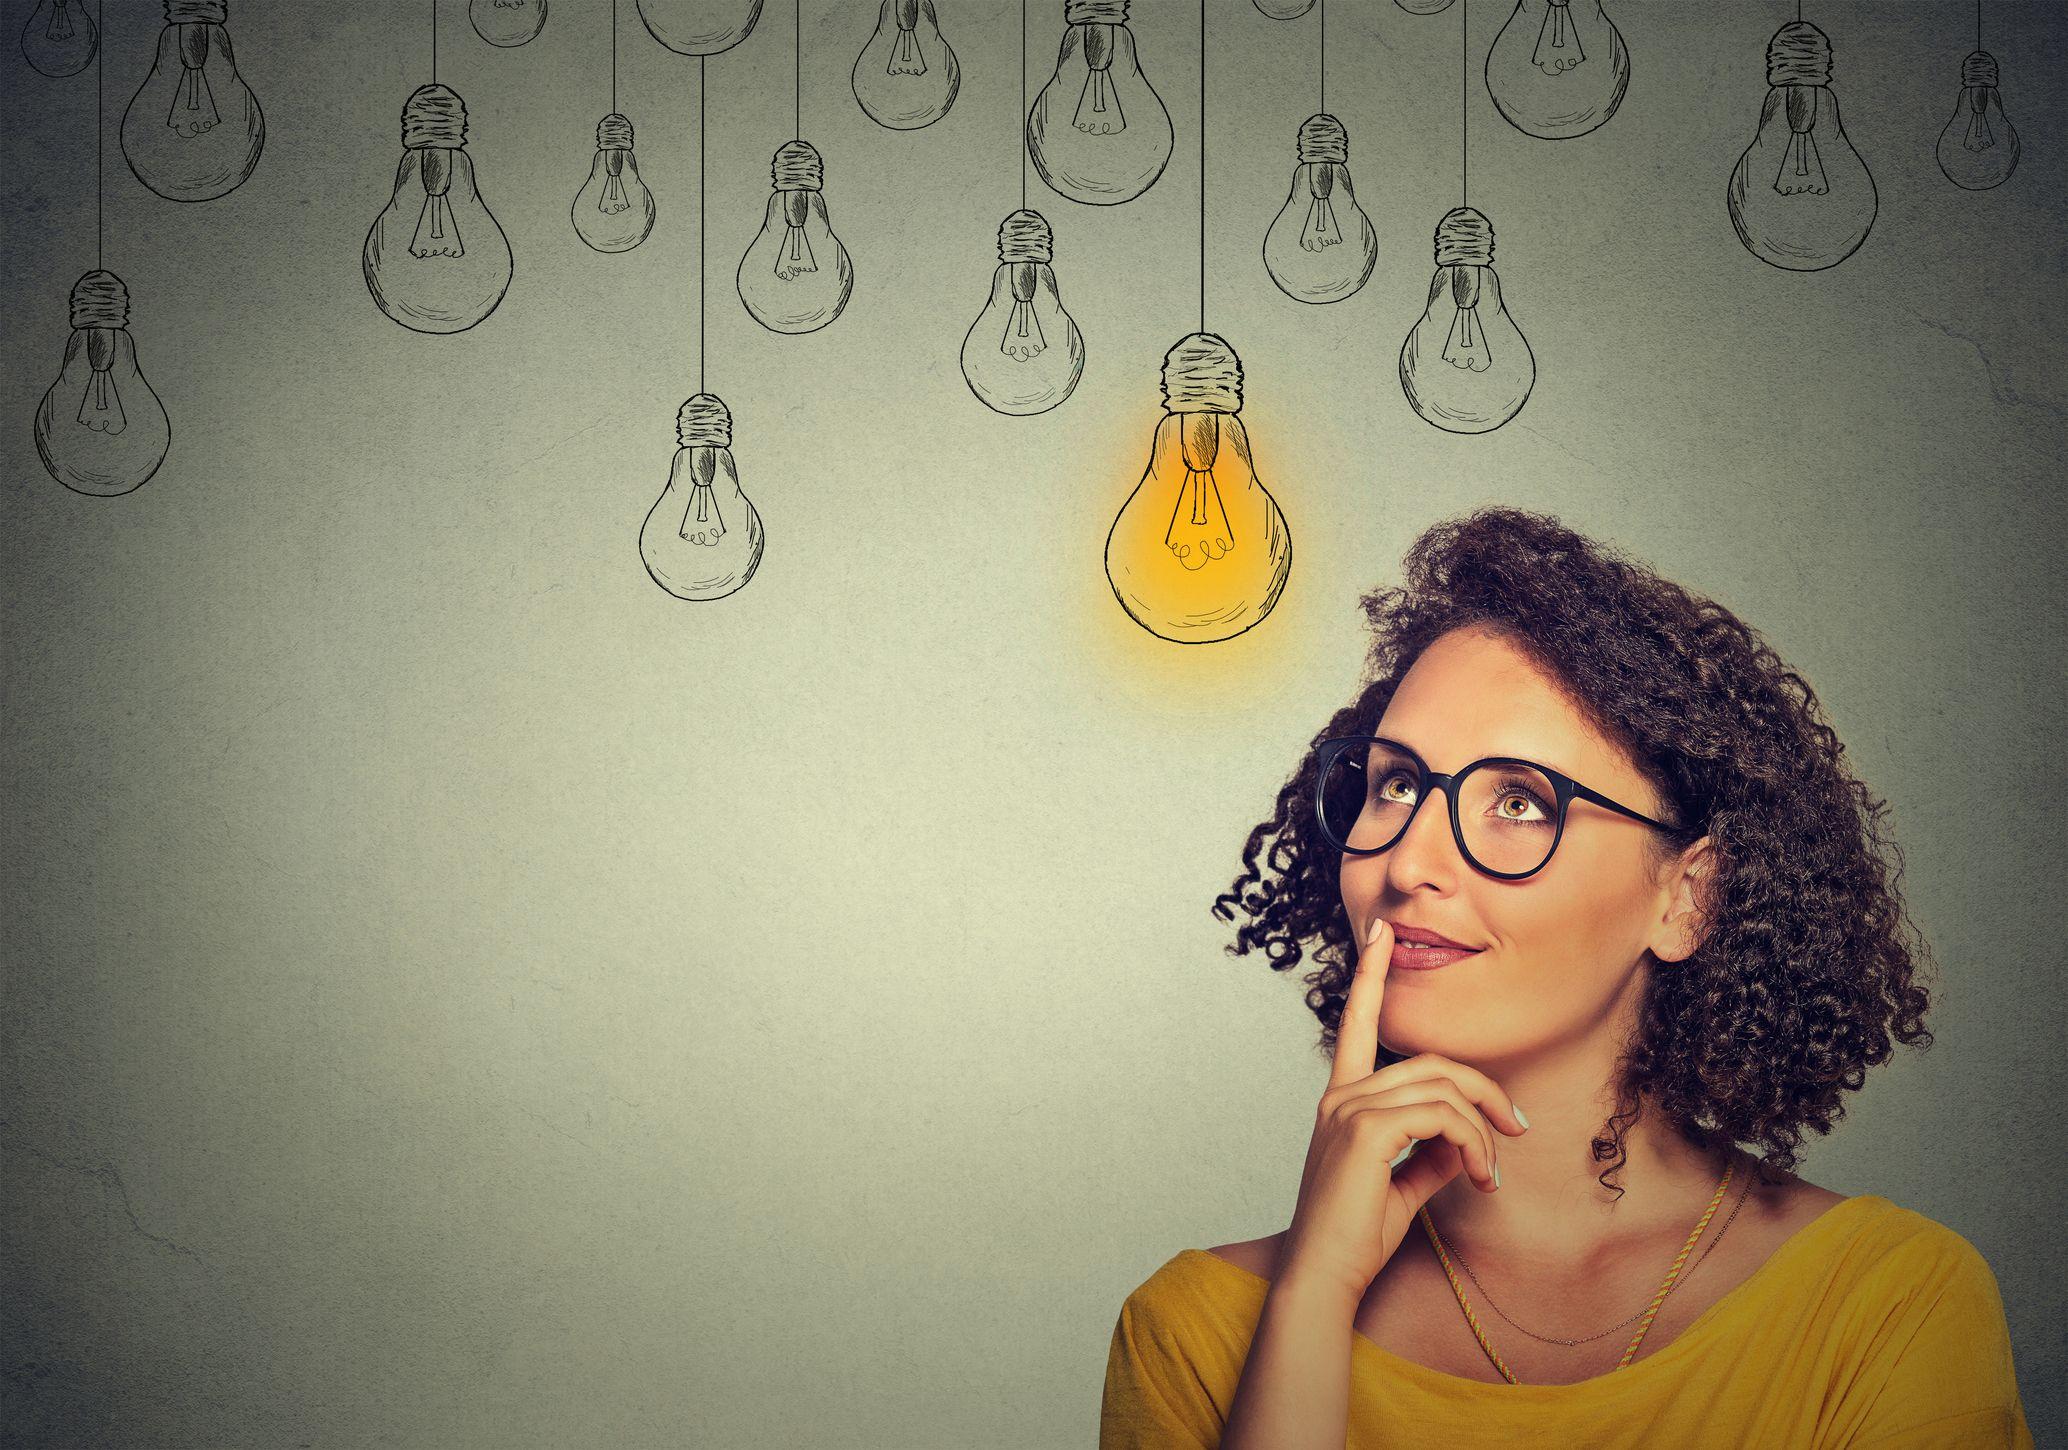 think-idea-light-bulb-stock